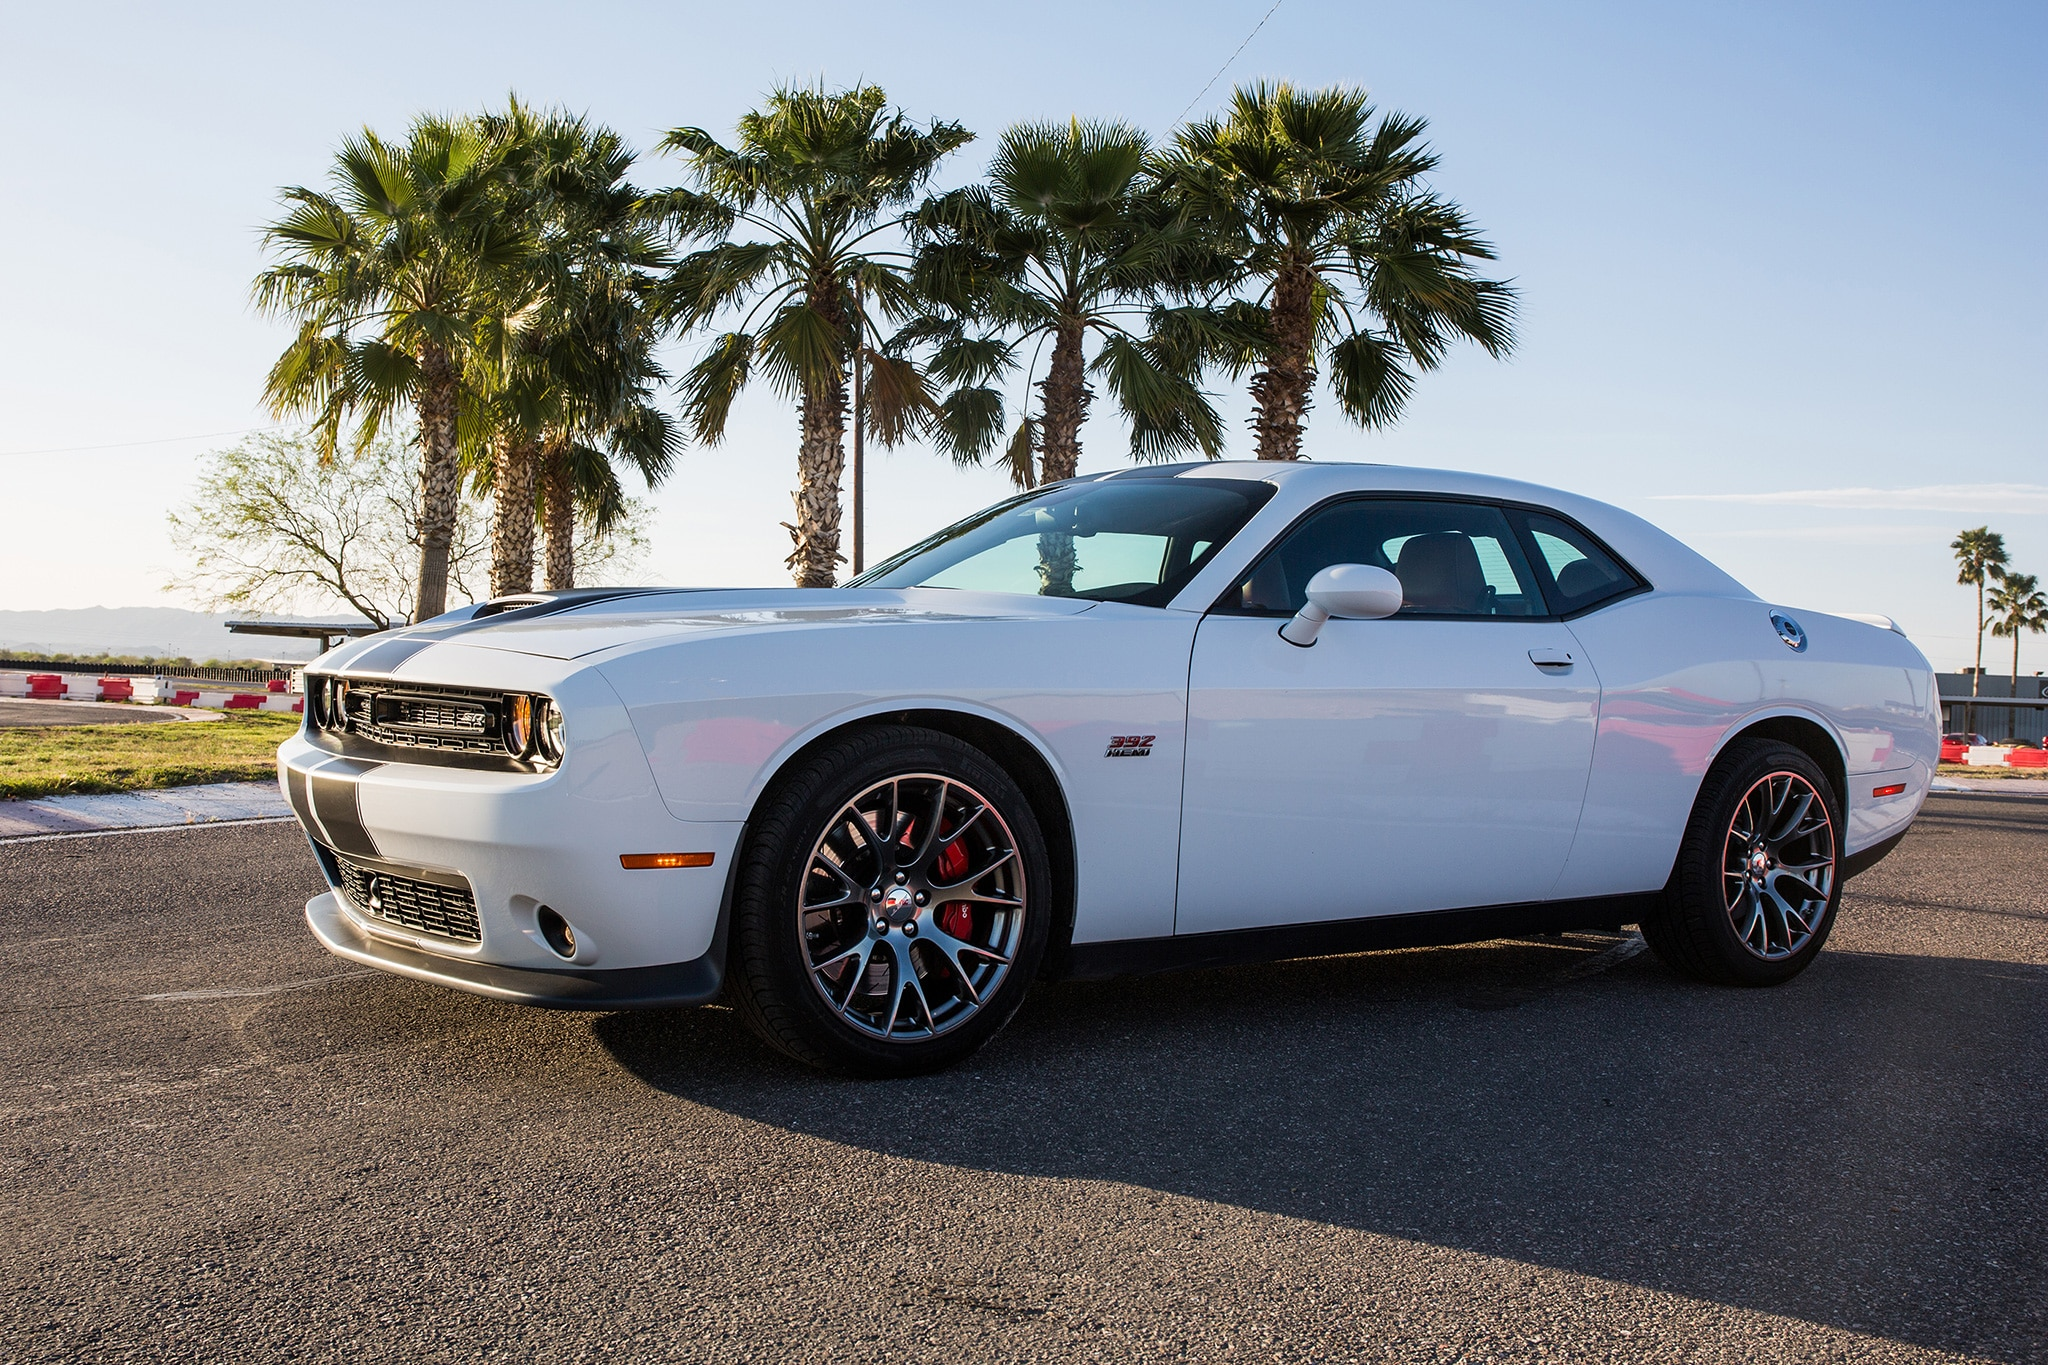 Dodge Challenger Srt8 2016 | 2017 - 2018 Best Cars Reviews